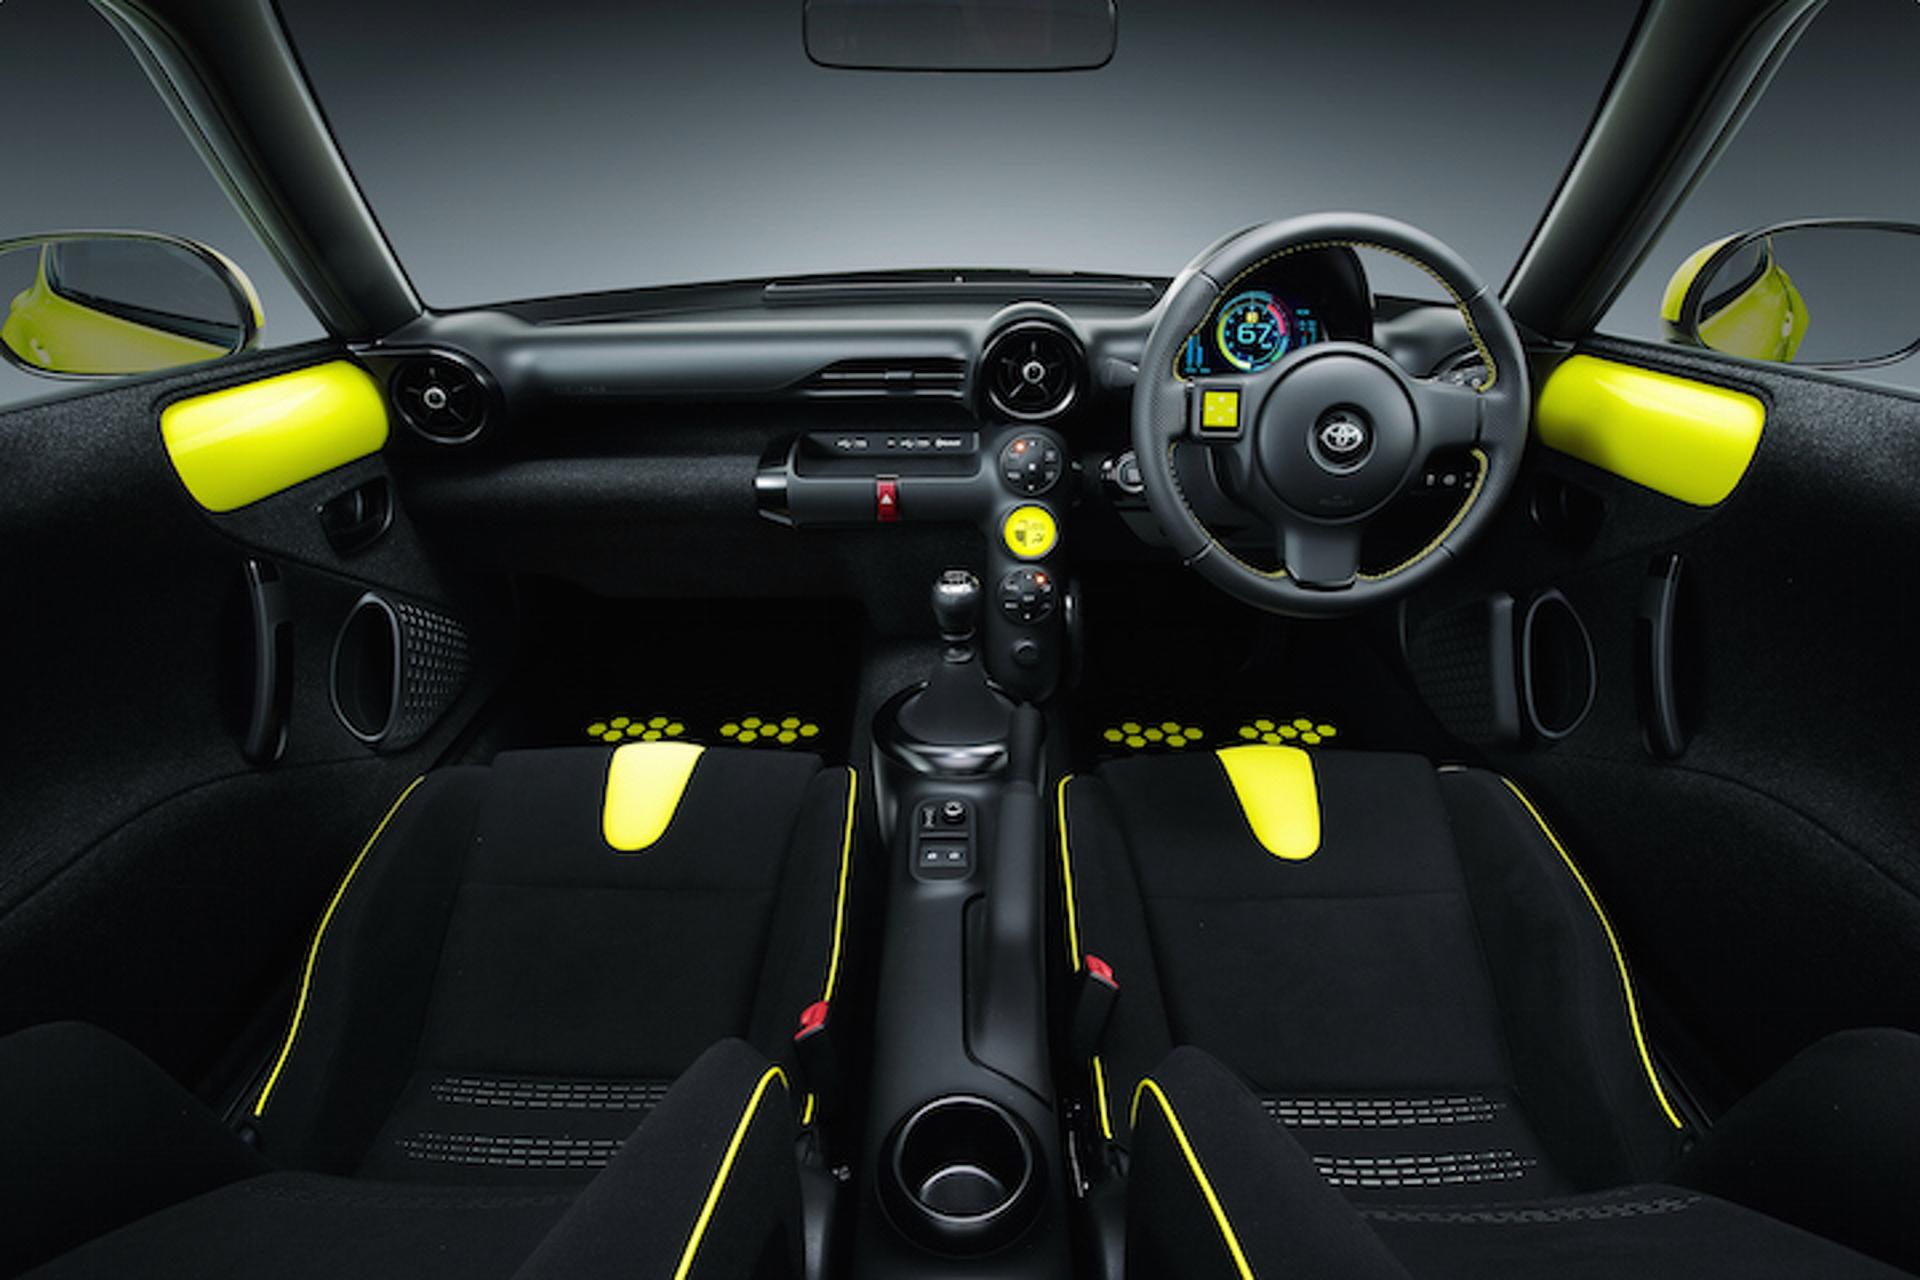 hr trim in geneva revealed news toyota toyotas show h motor production c